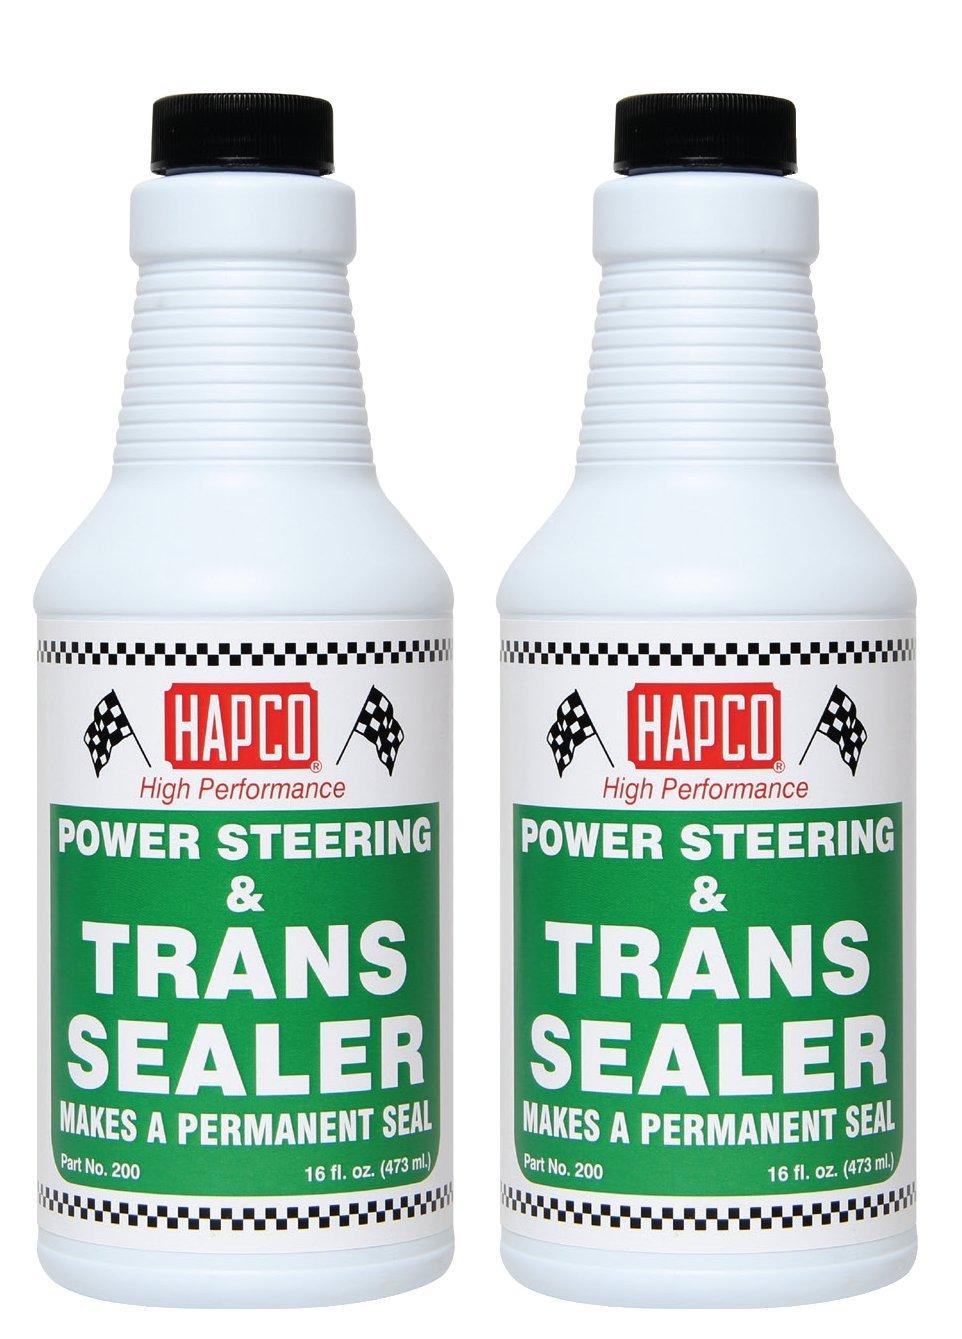 Hapco Products - Power Steering & Trans Sealer (Pack of 2)